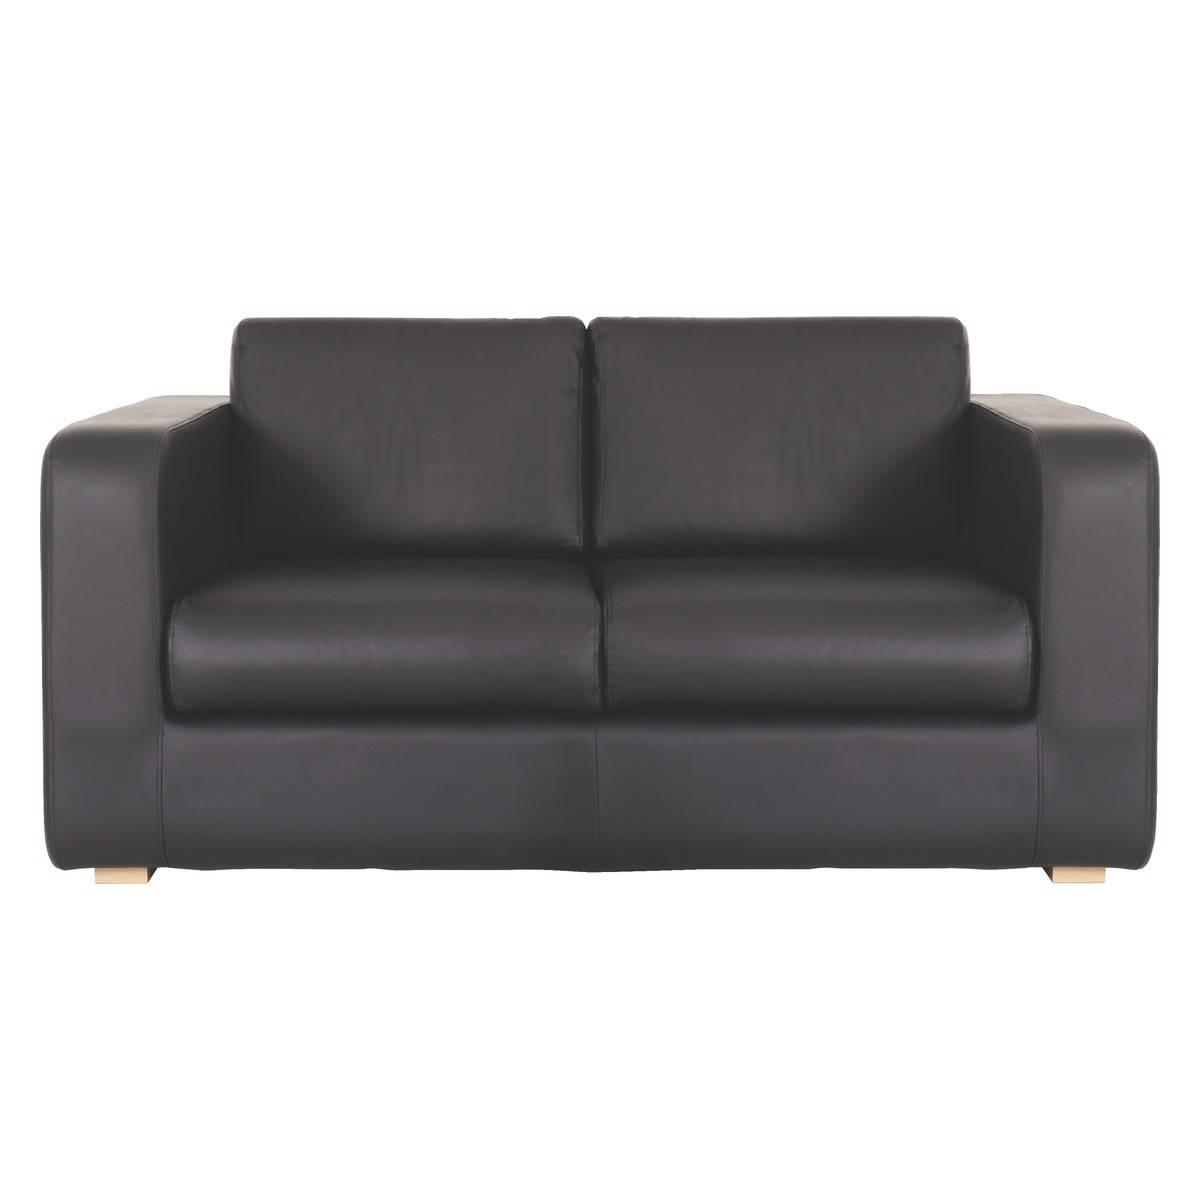 m s sofas uk wicker sofa cushions 2018 best of black 2 seater